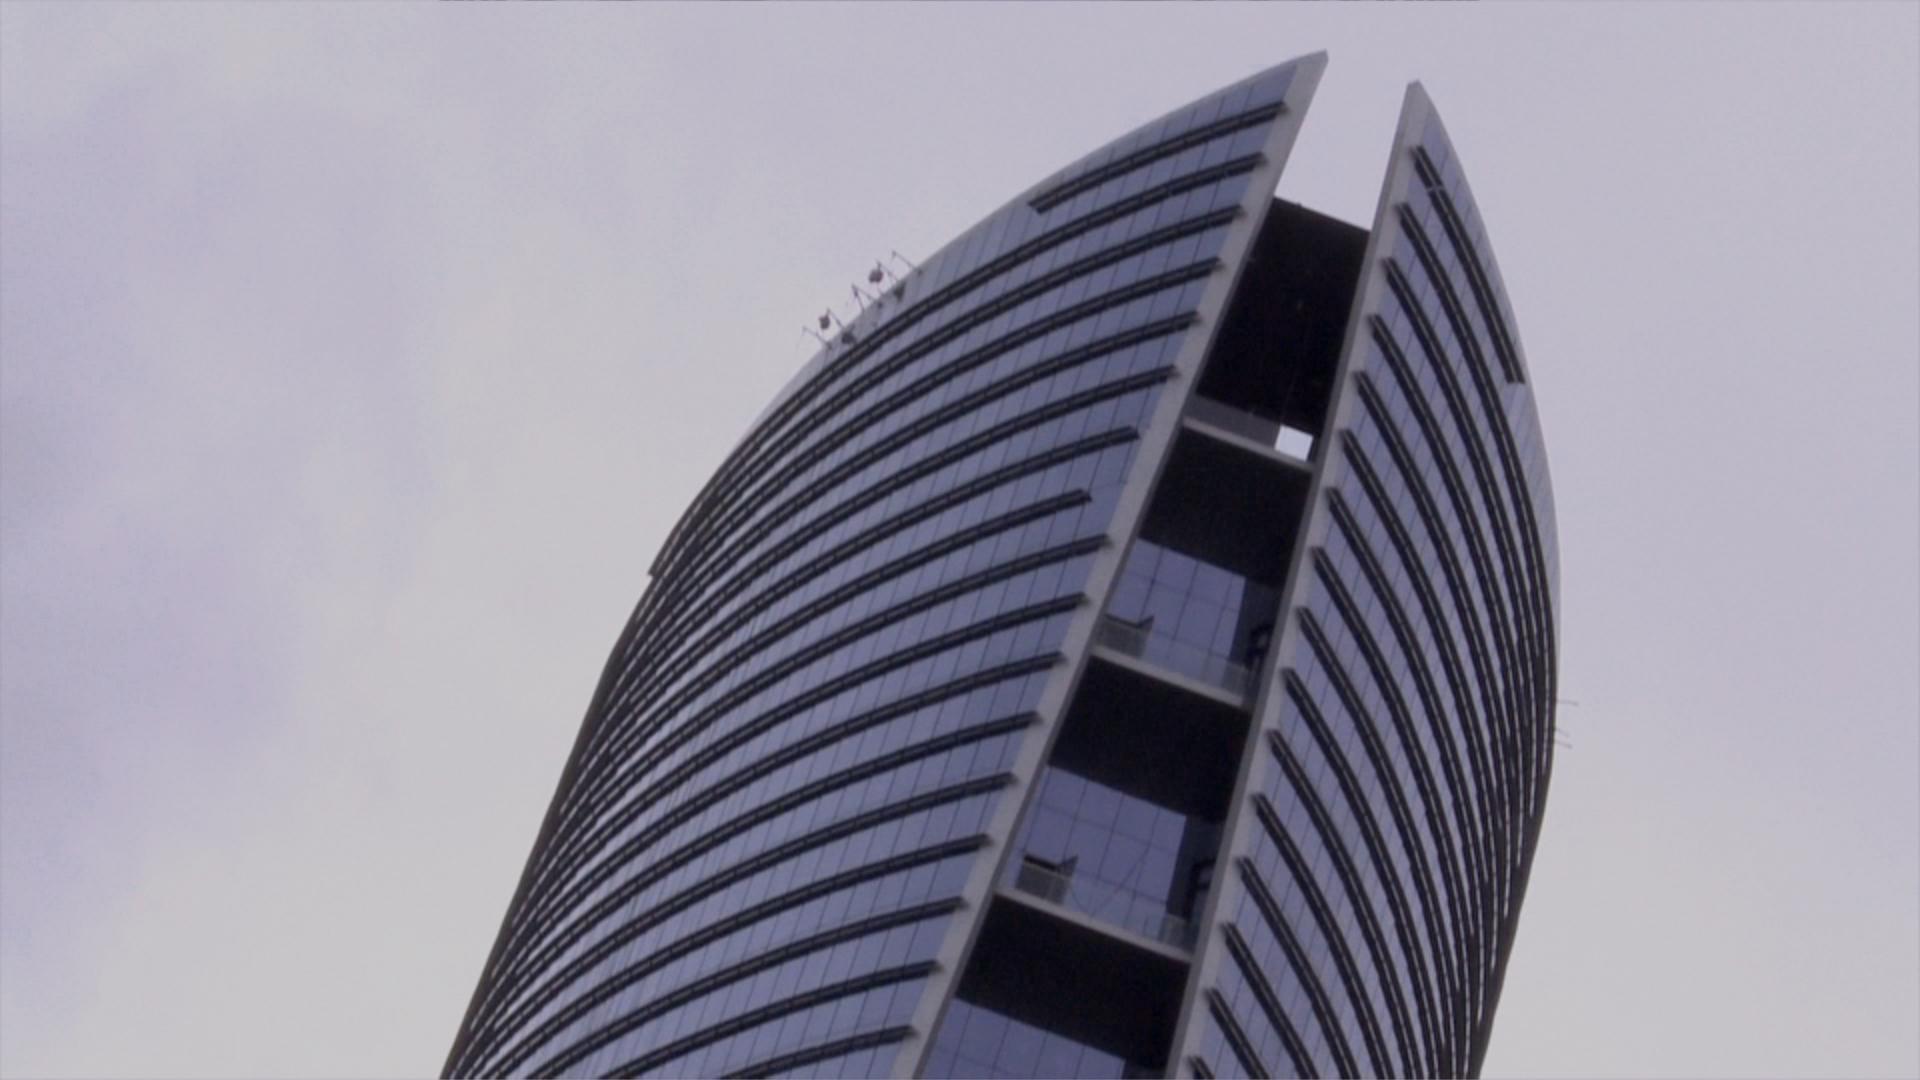 Sao-Paul2.jpg